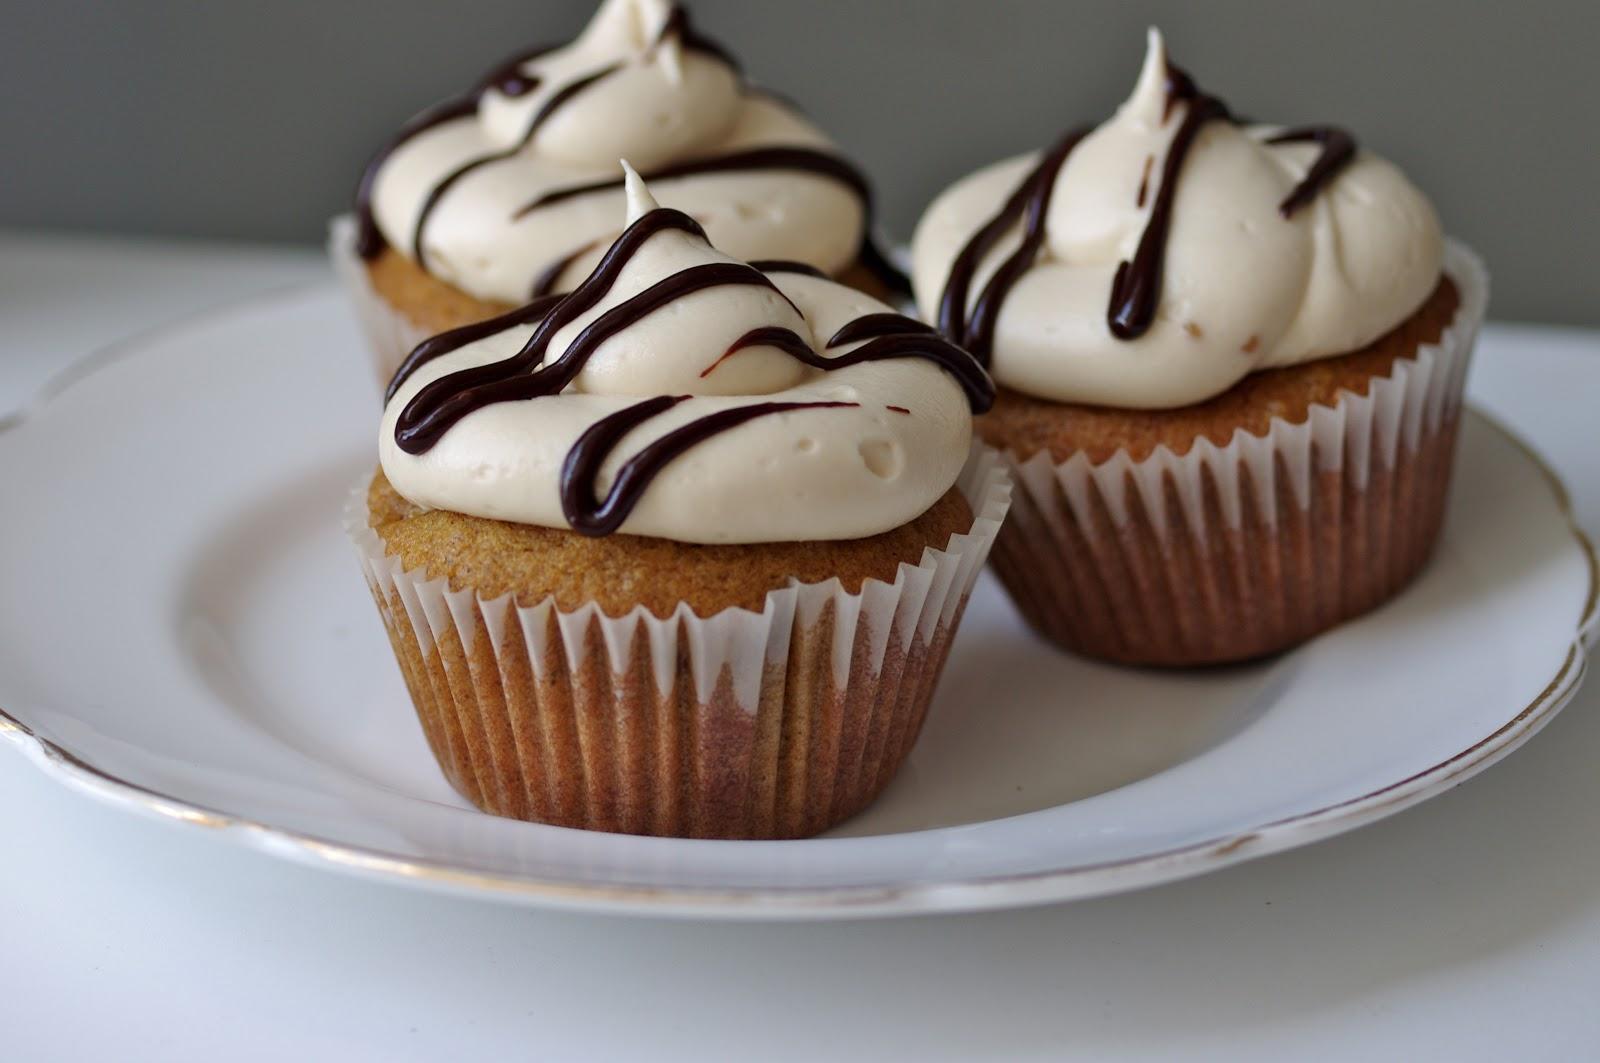 The Cupcake Suite: October Pumpkin Cupcakes